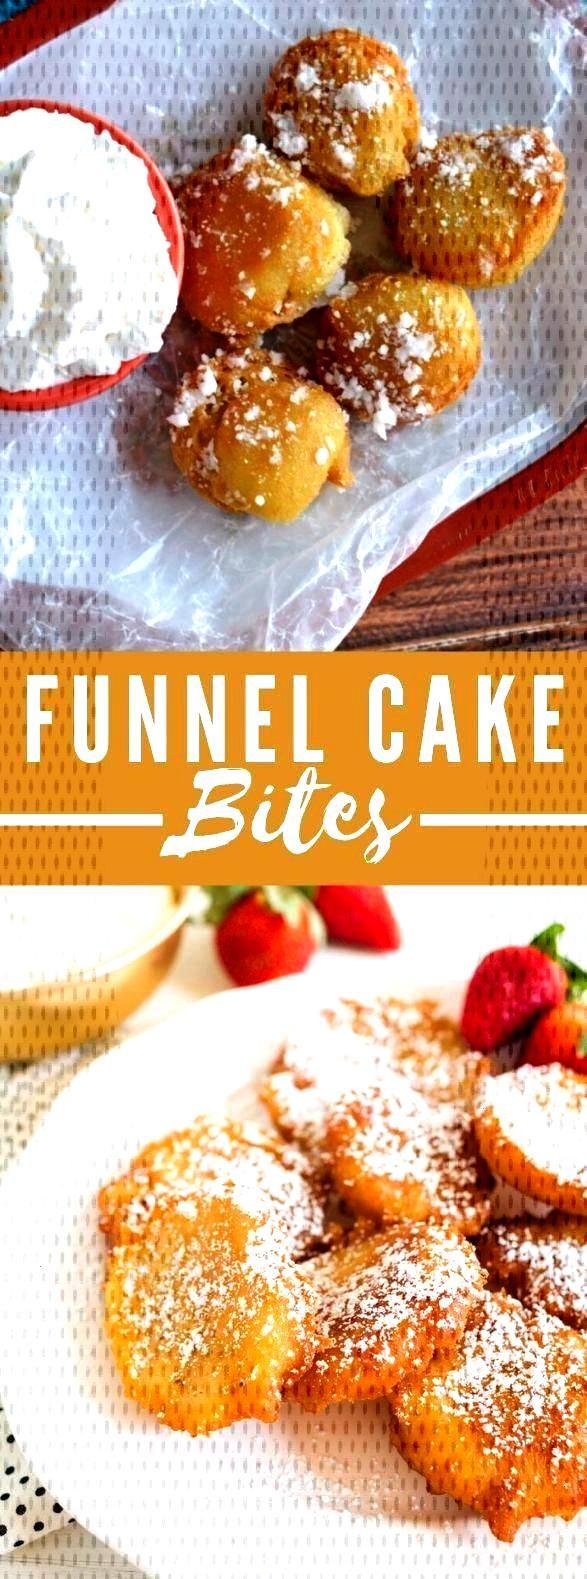 Funnel Cake Bites Recipe - Yummy Chocolate amp Dessert - - vegan Funnel cake -